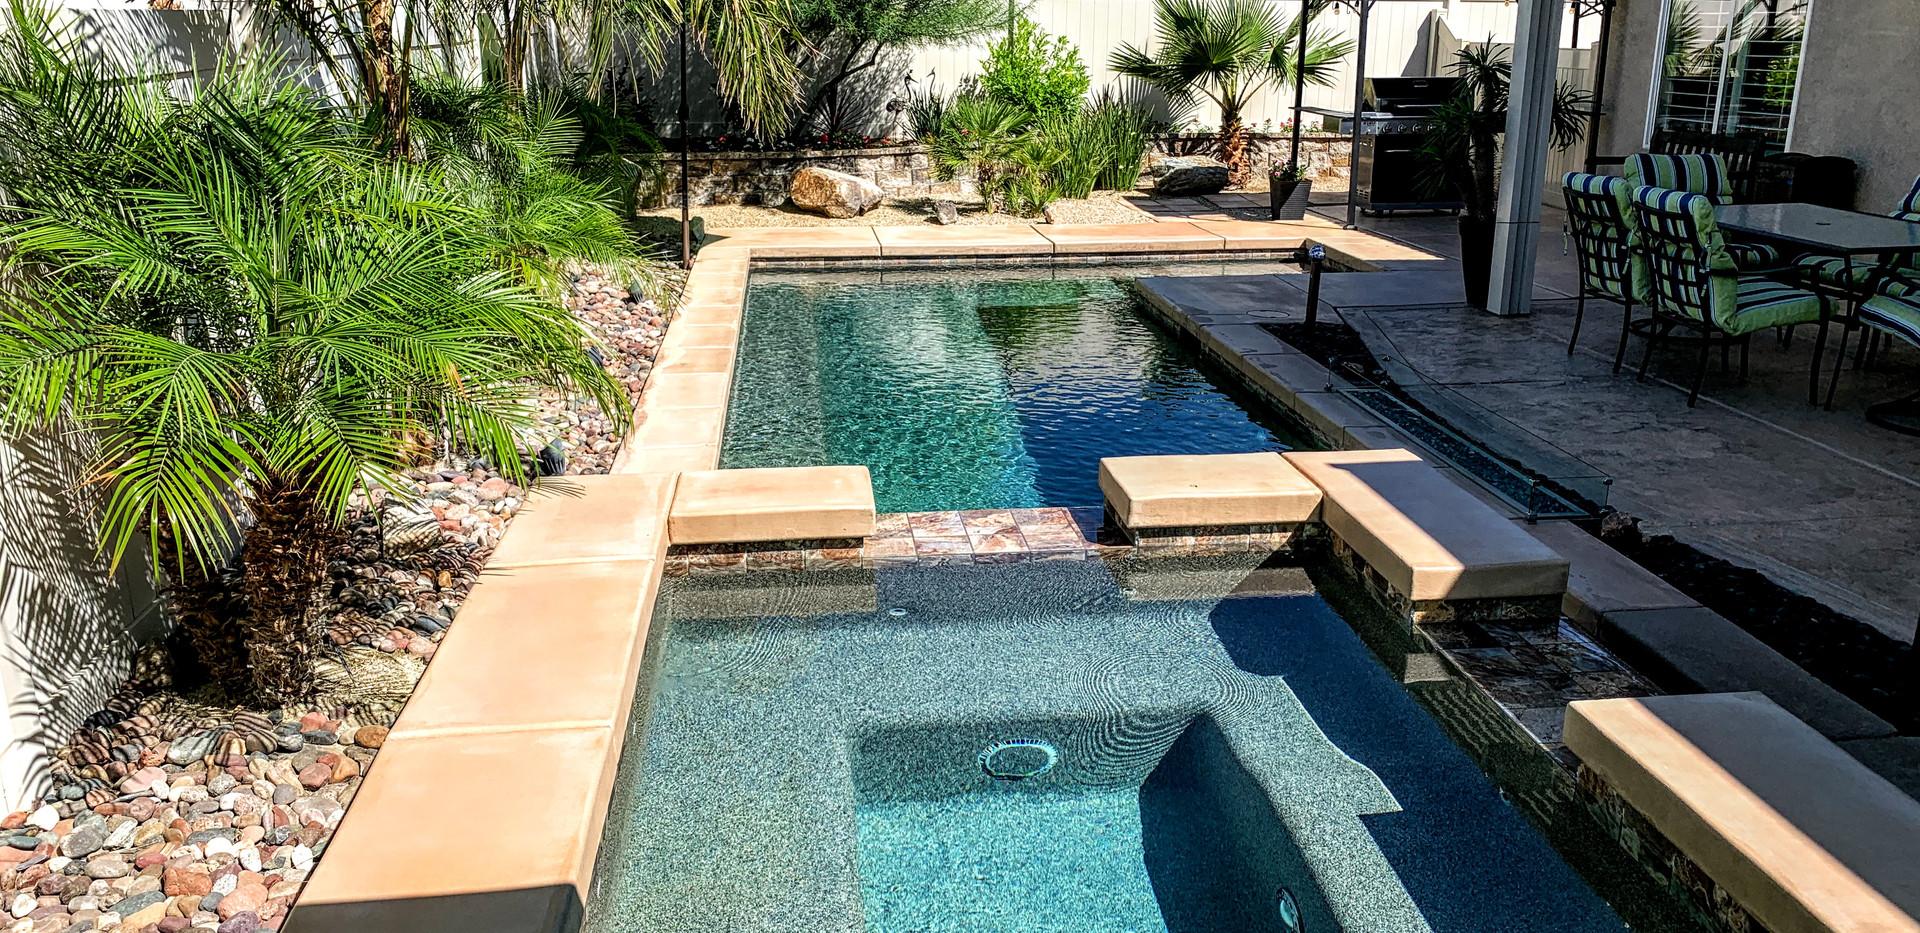 08-Yard-Pool-5.jpg